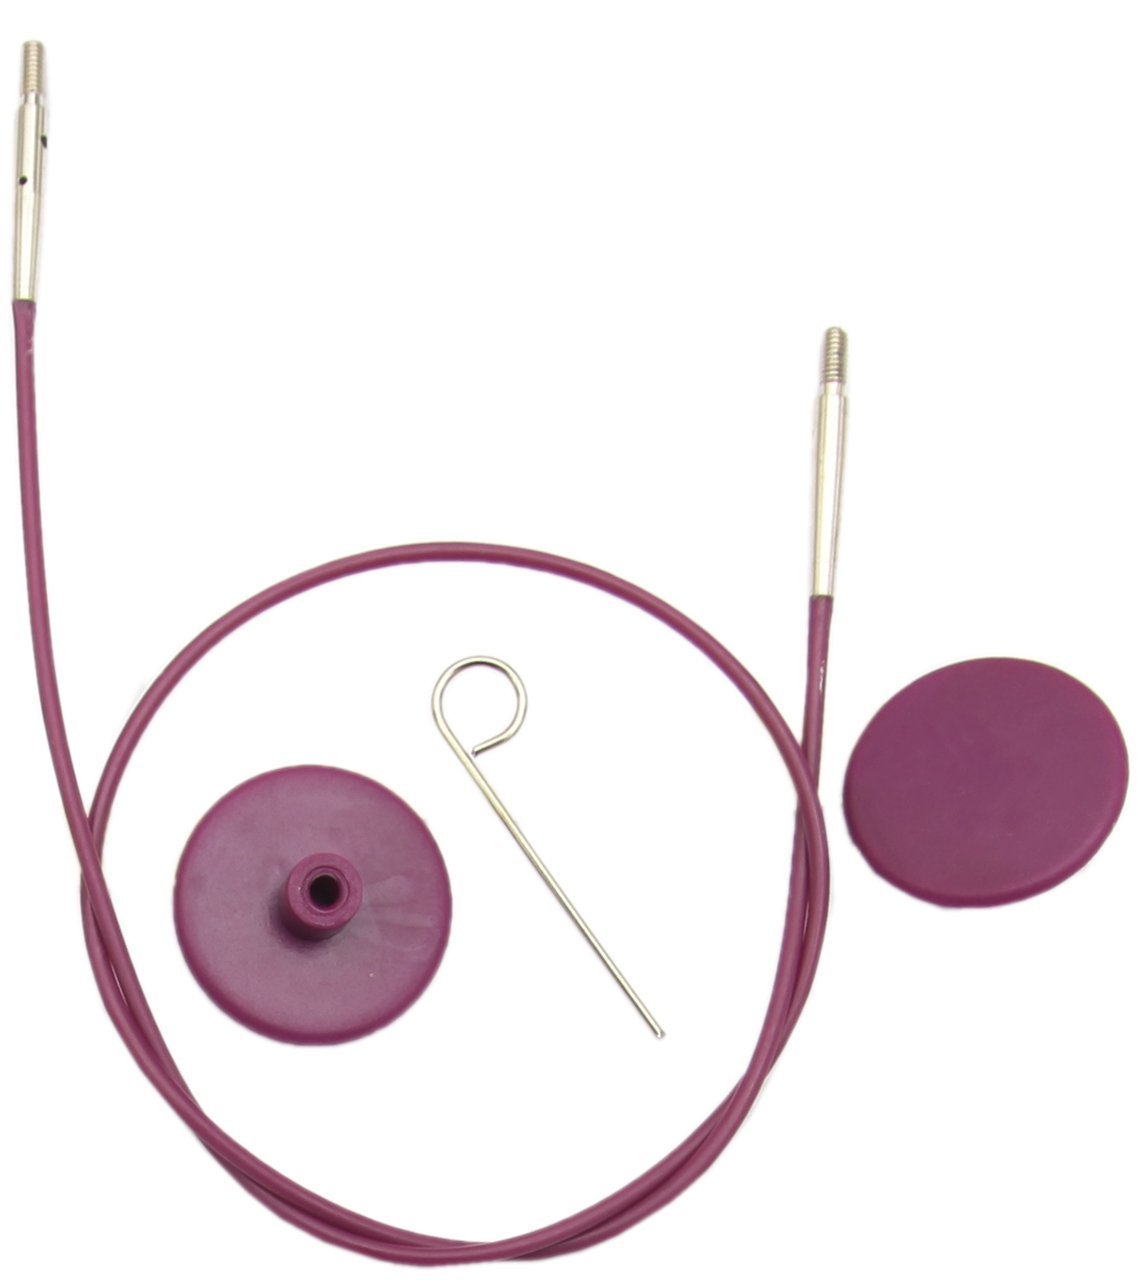 KnitPro Леска сменная Purple Silver 150 см 10505